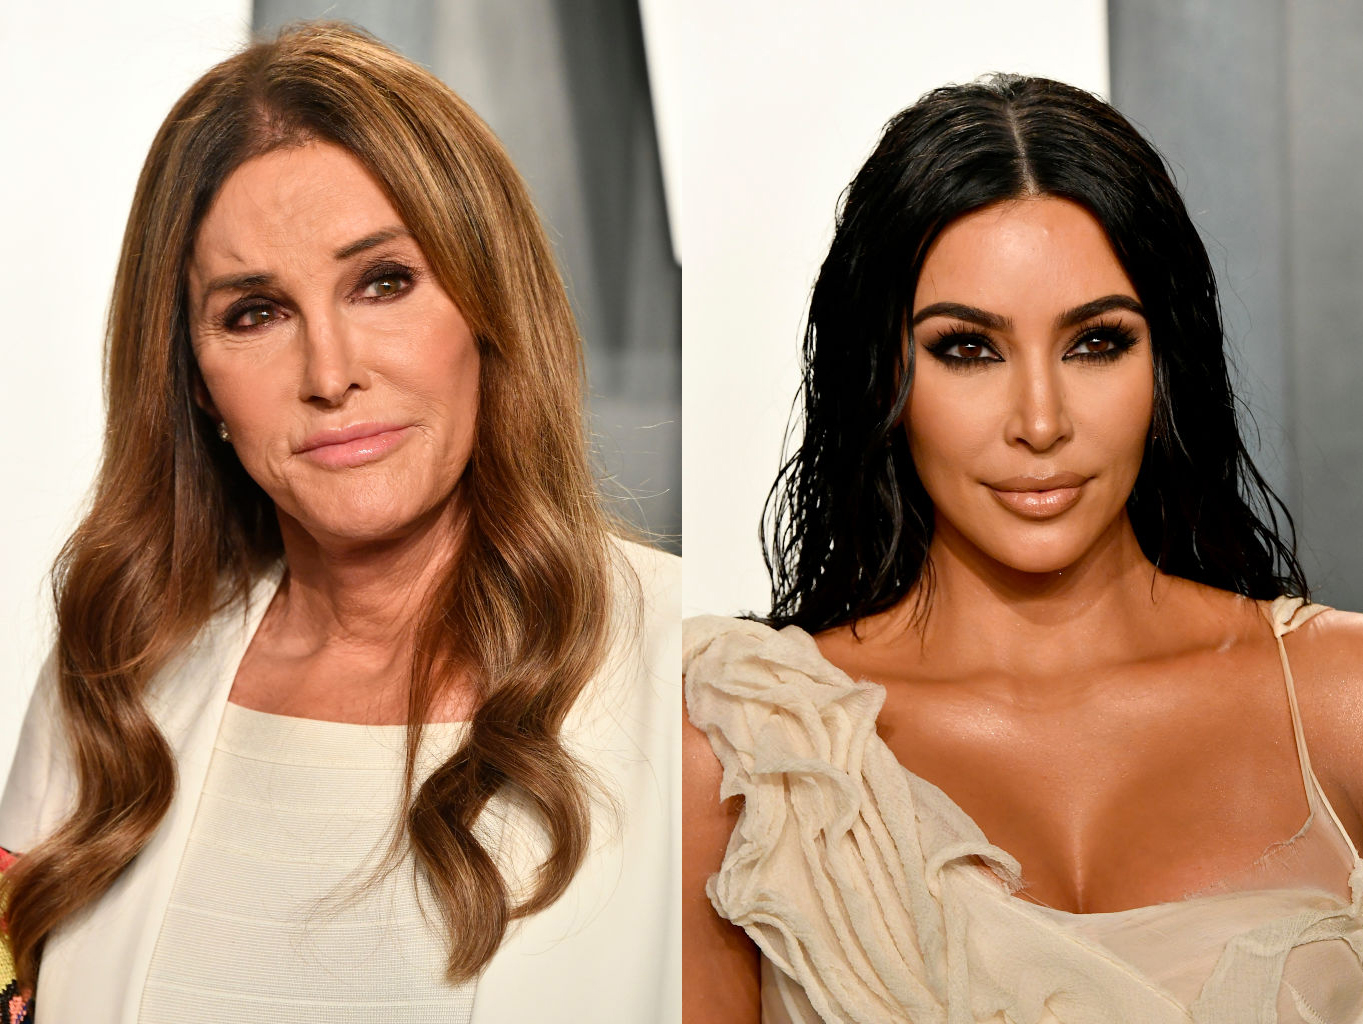 Caitlyn Jenner Plans For Running As Governor Includes Hiring Kim Kardashian As Her Criminal Justice Reform Advisor